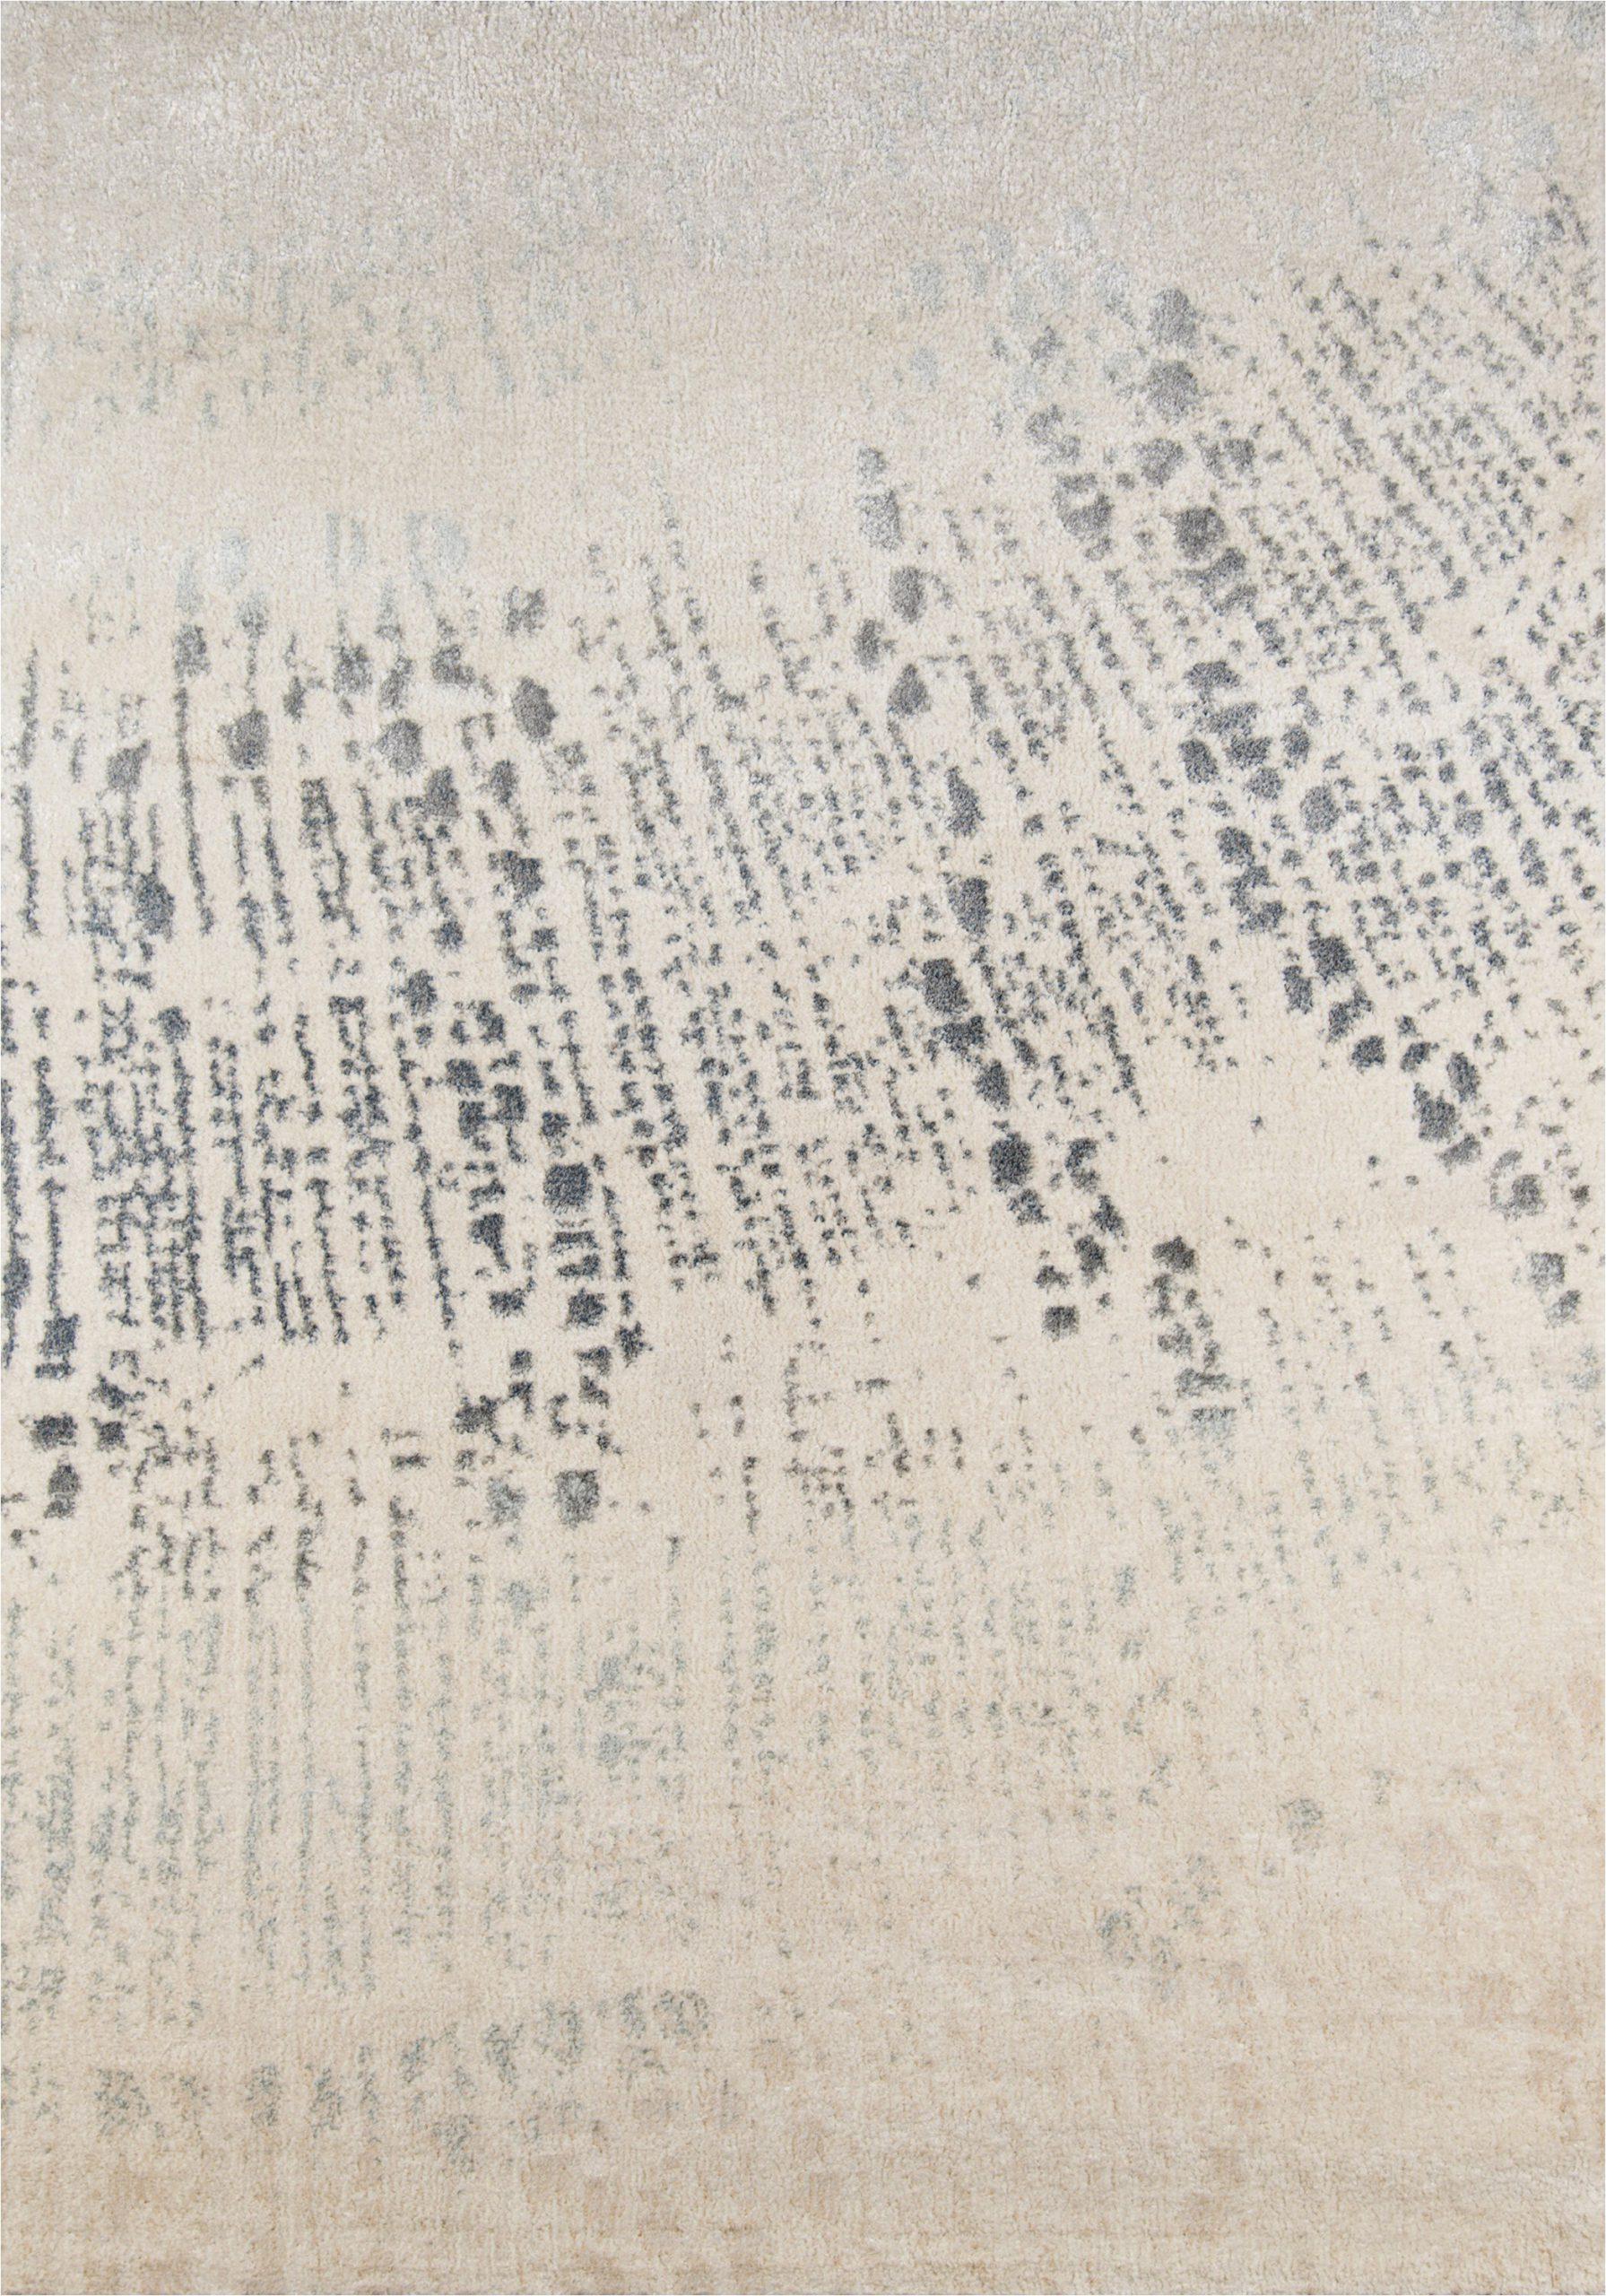 danny grayivory rug